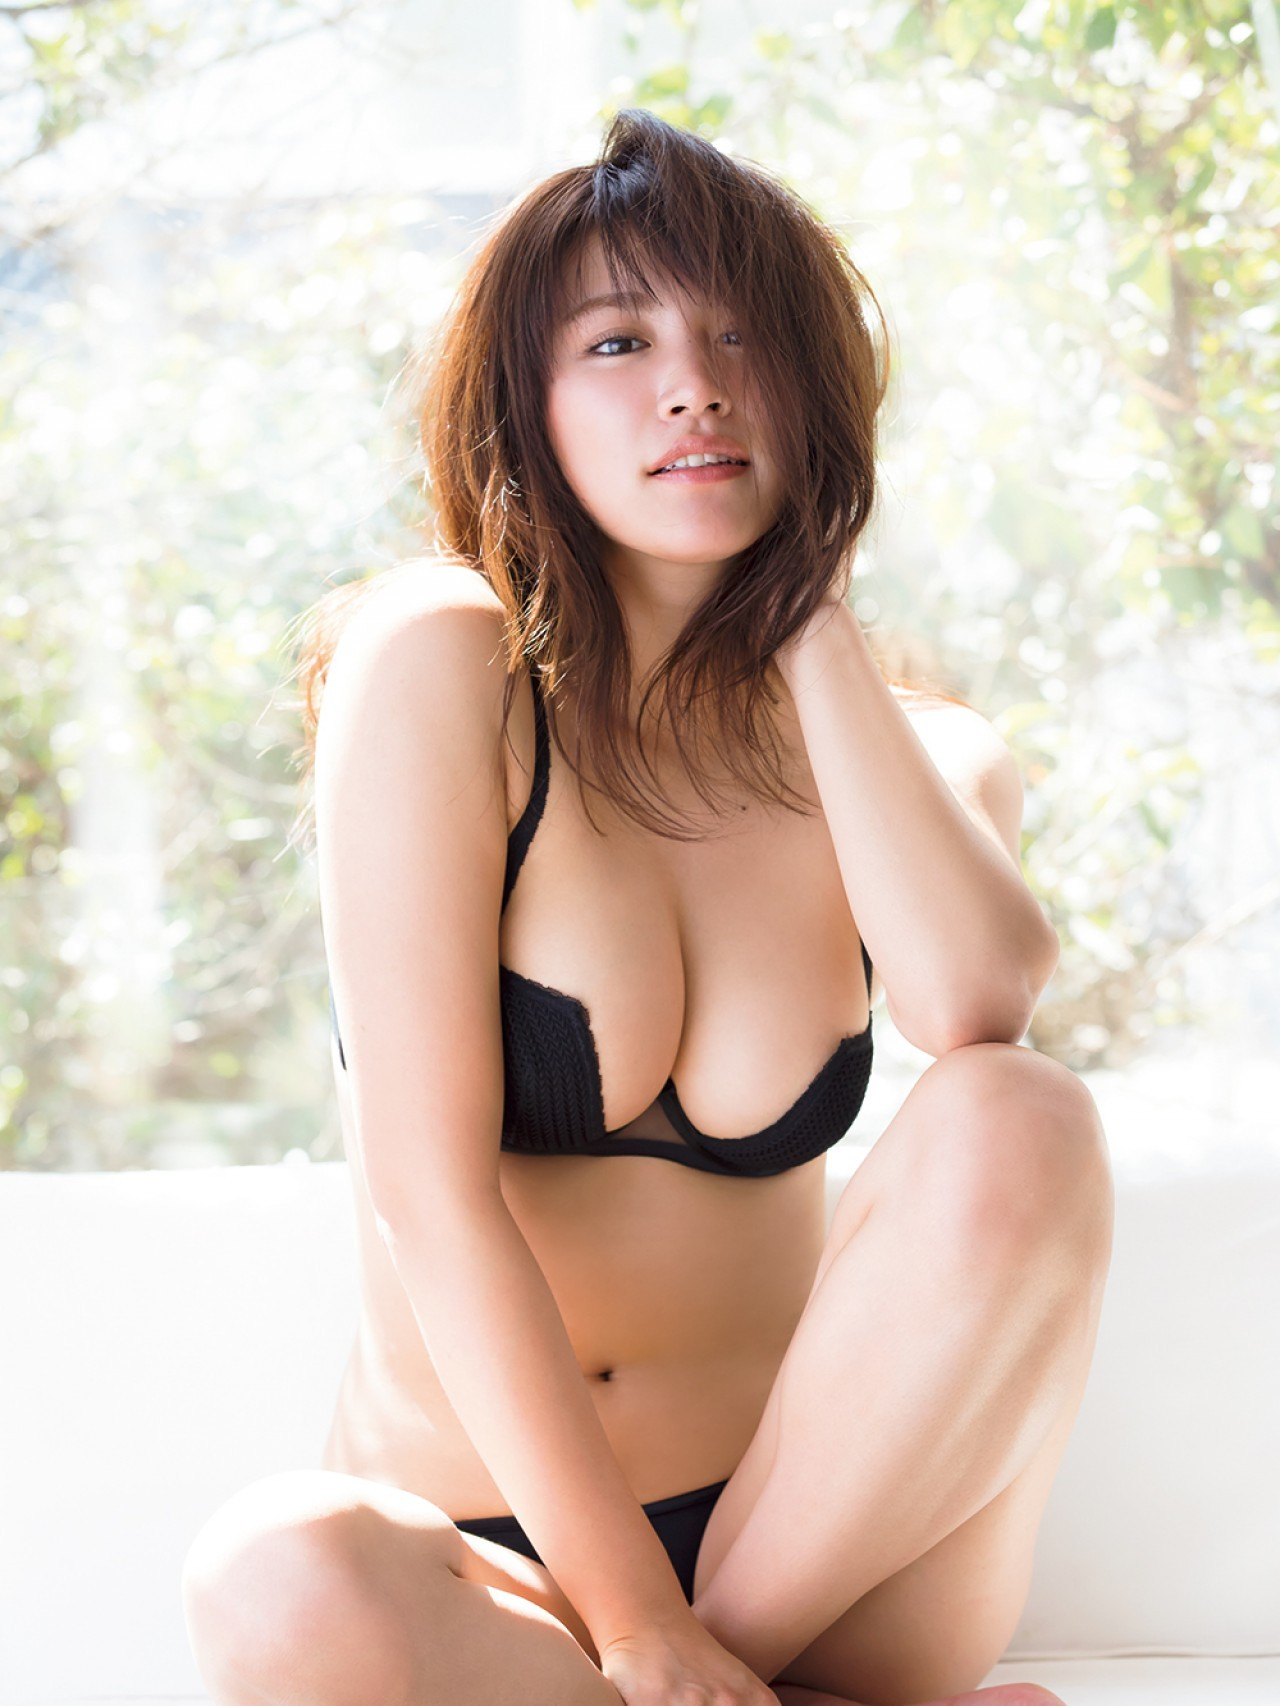 Tattoo Girl Hd Wallpaper Download Wallpaper Ikumi Hisamatsu Women Asian Model 1280x1706